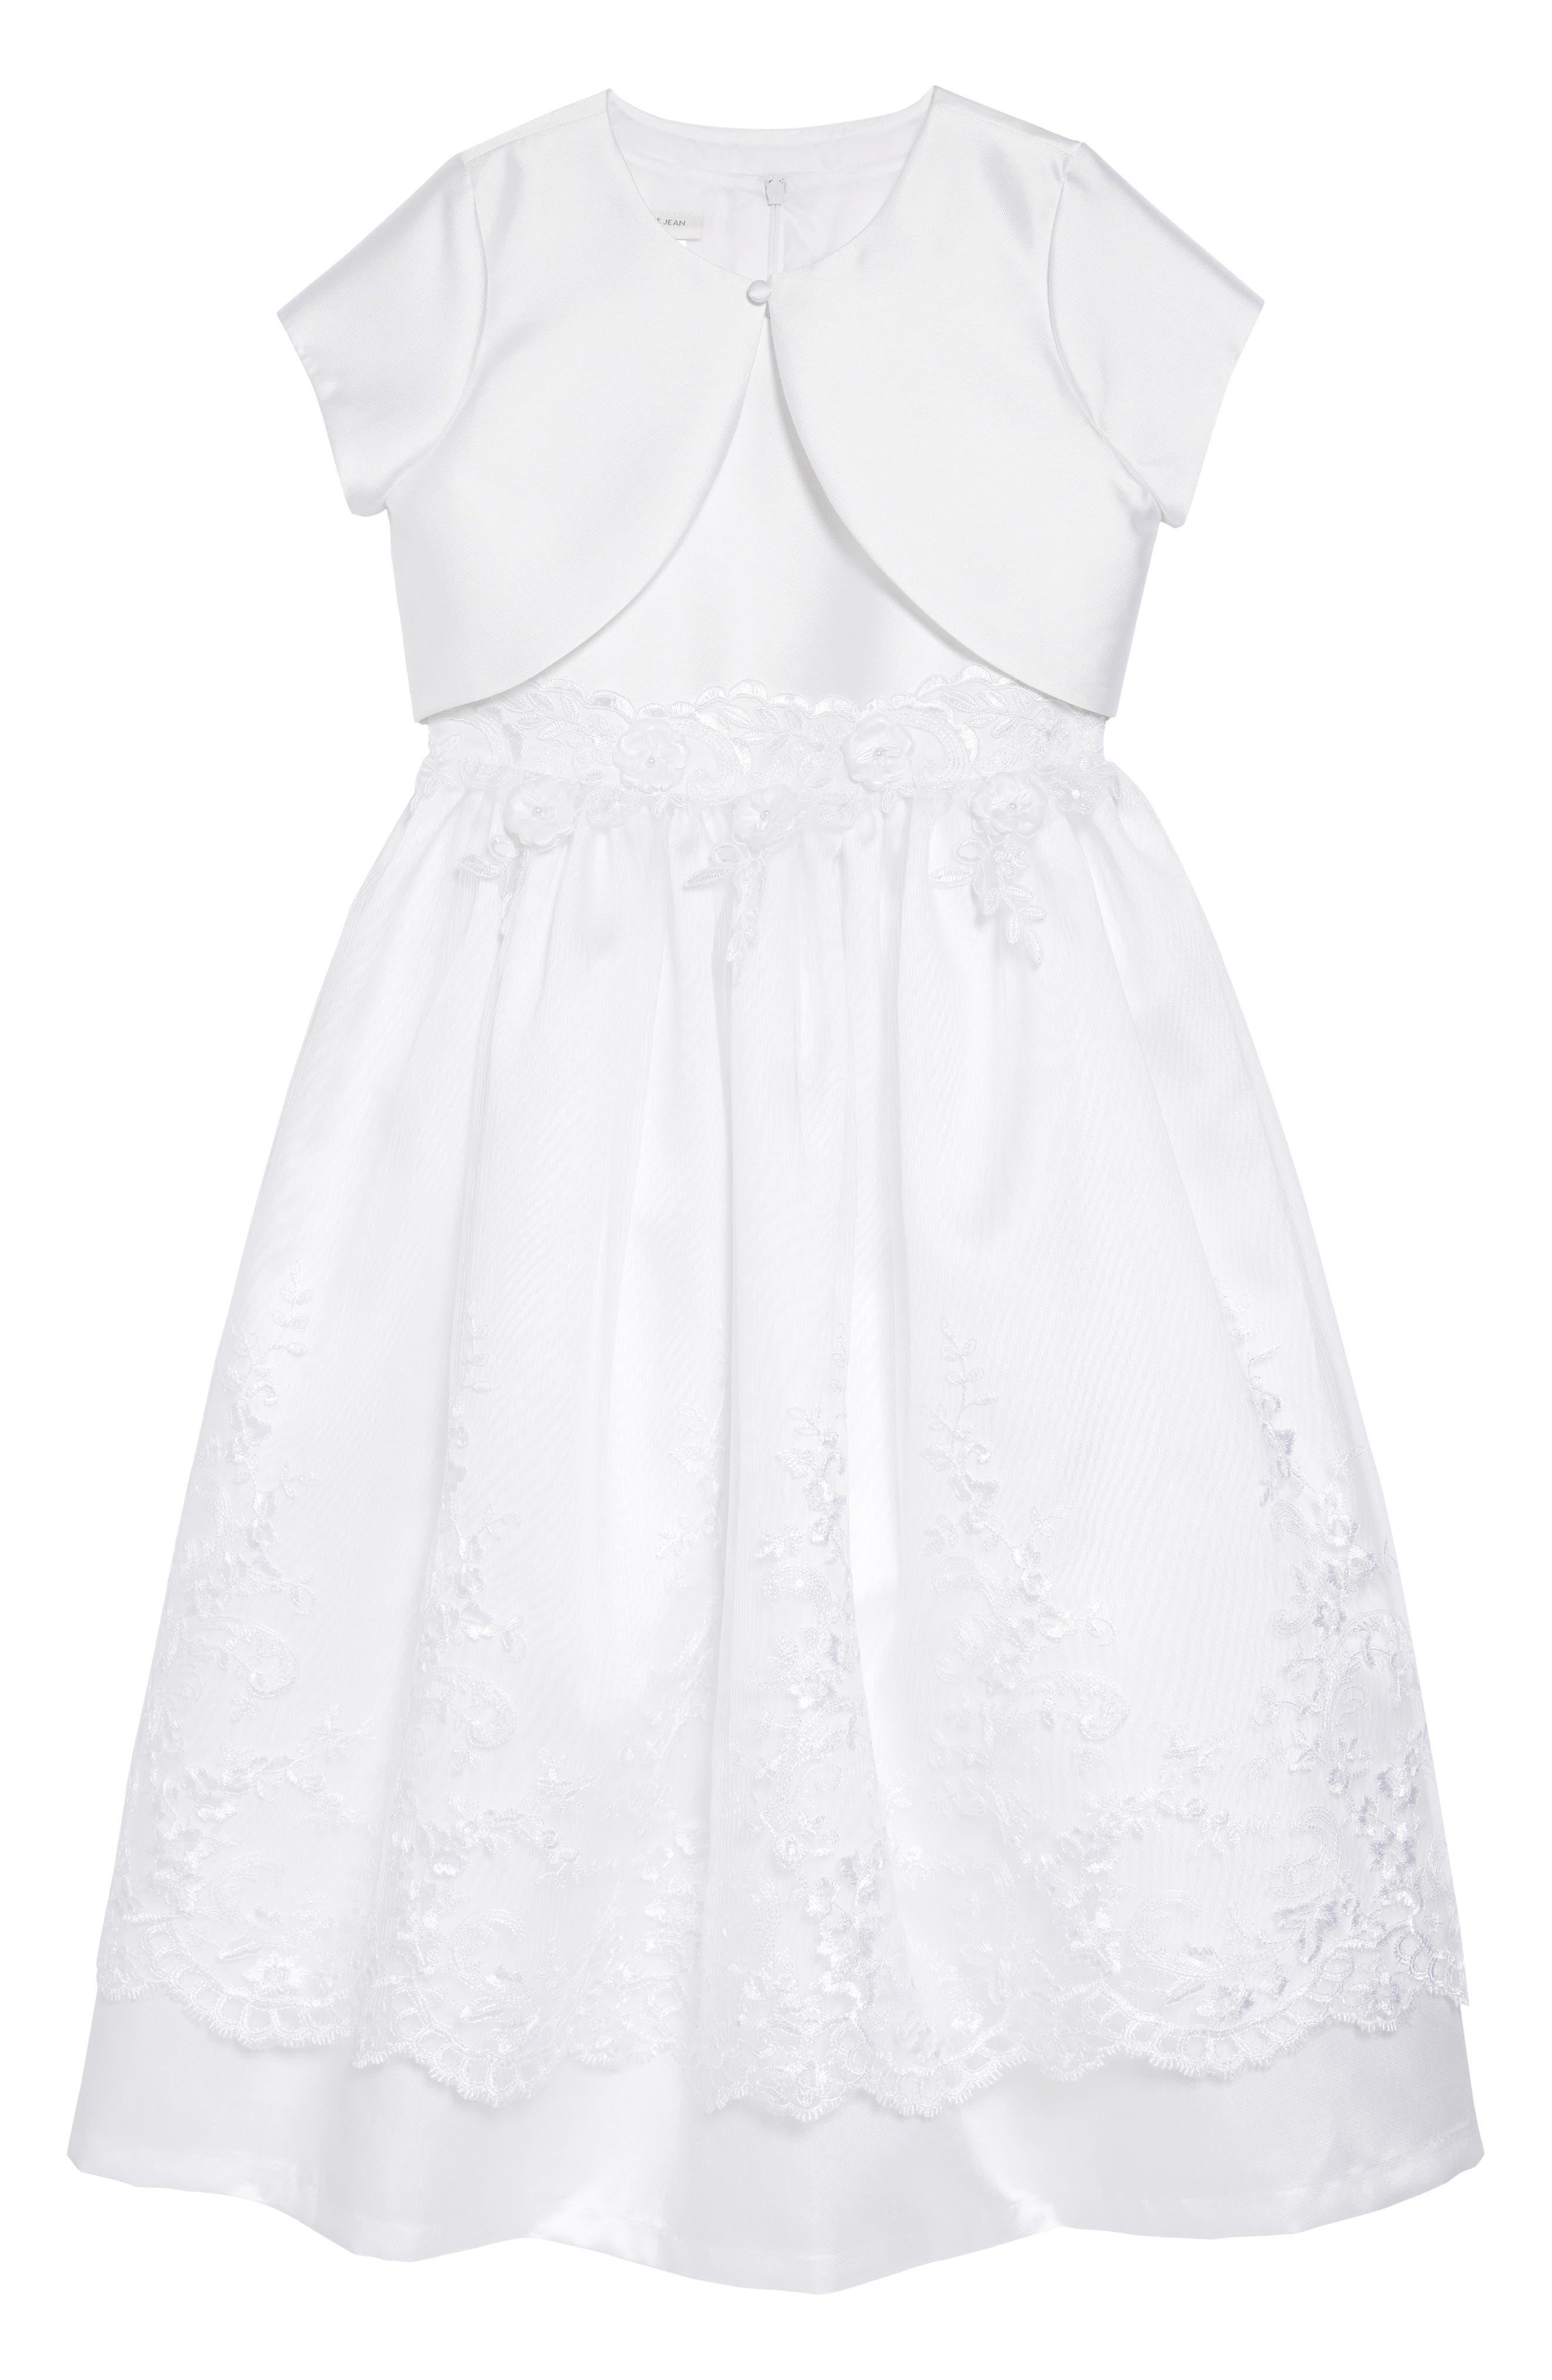 IRIS & IVY Sweetheart Fit & Flare Mikado Dress & Jacket Set, Main, color, WHITE